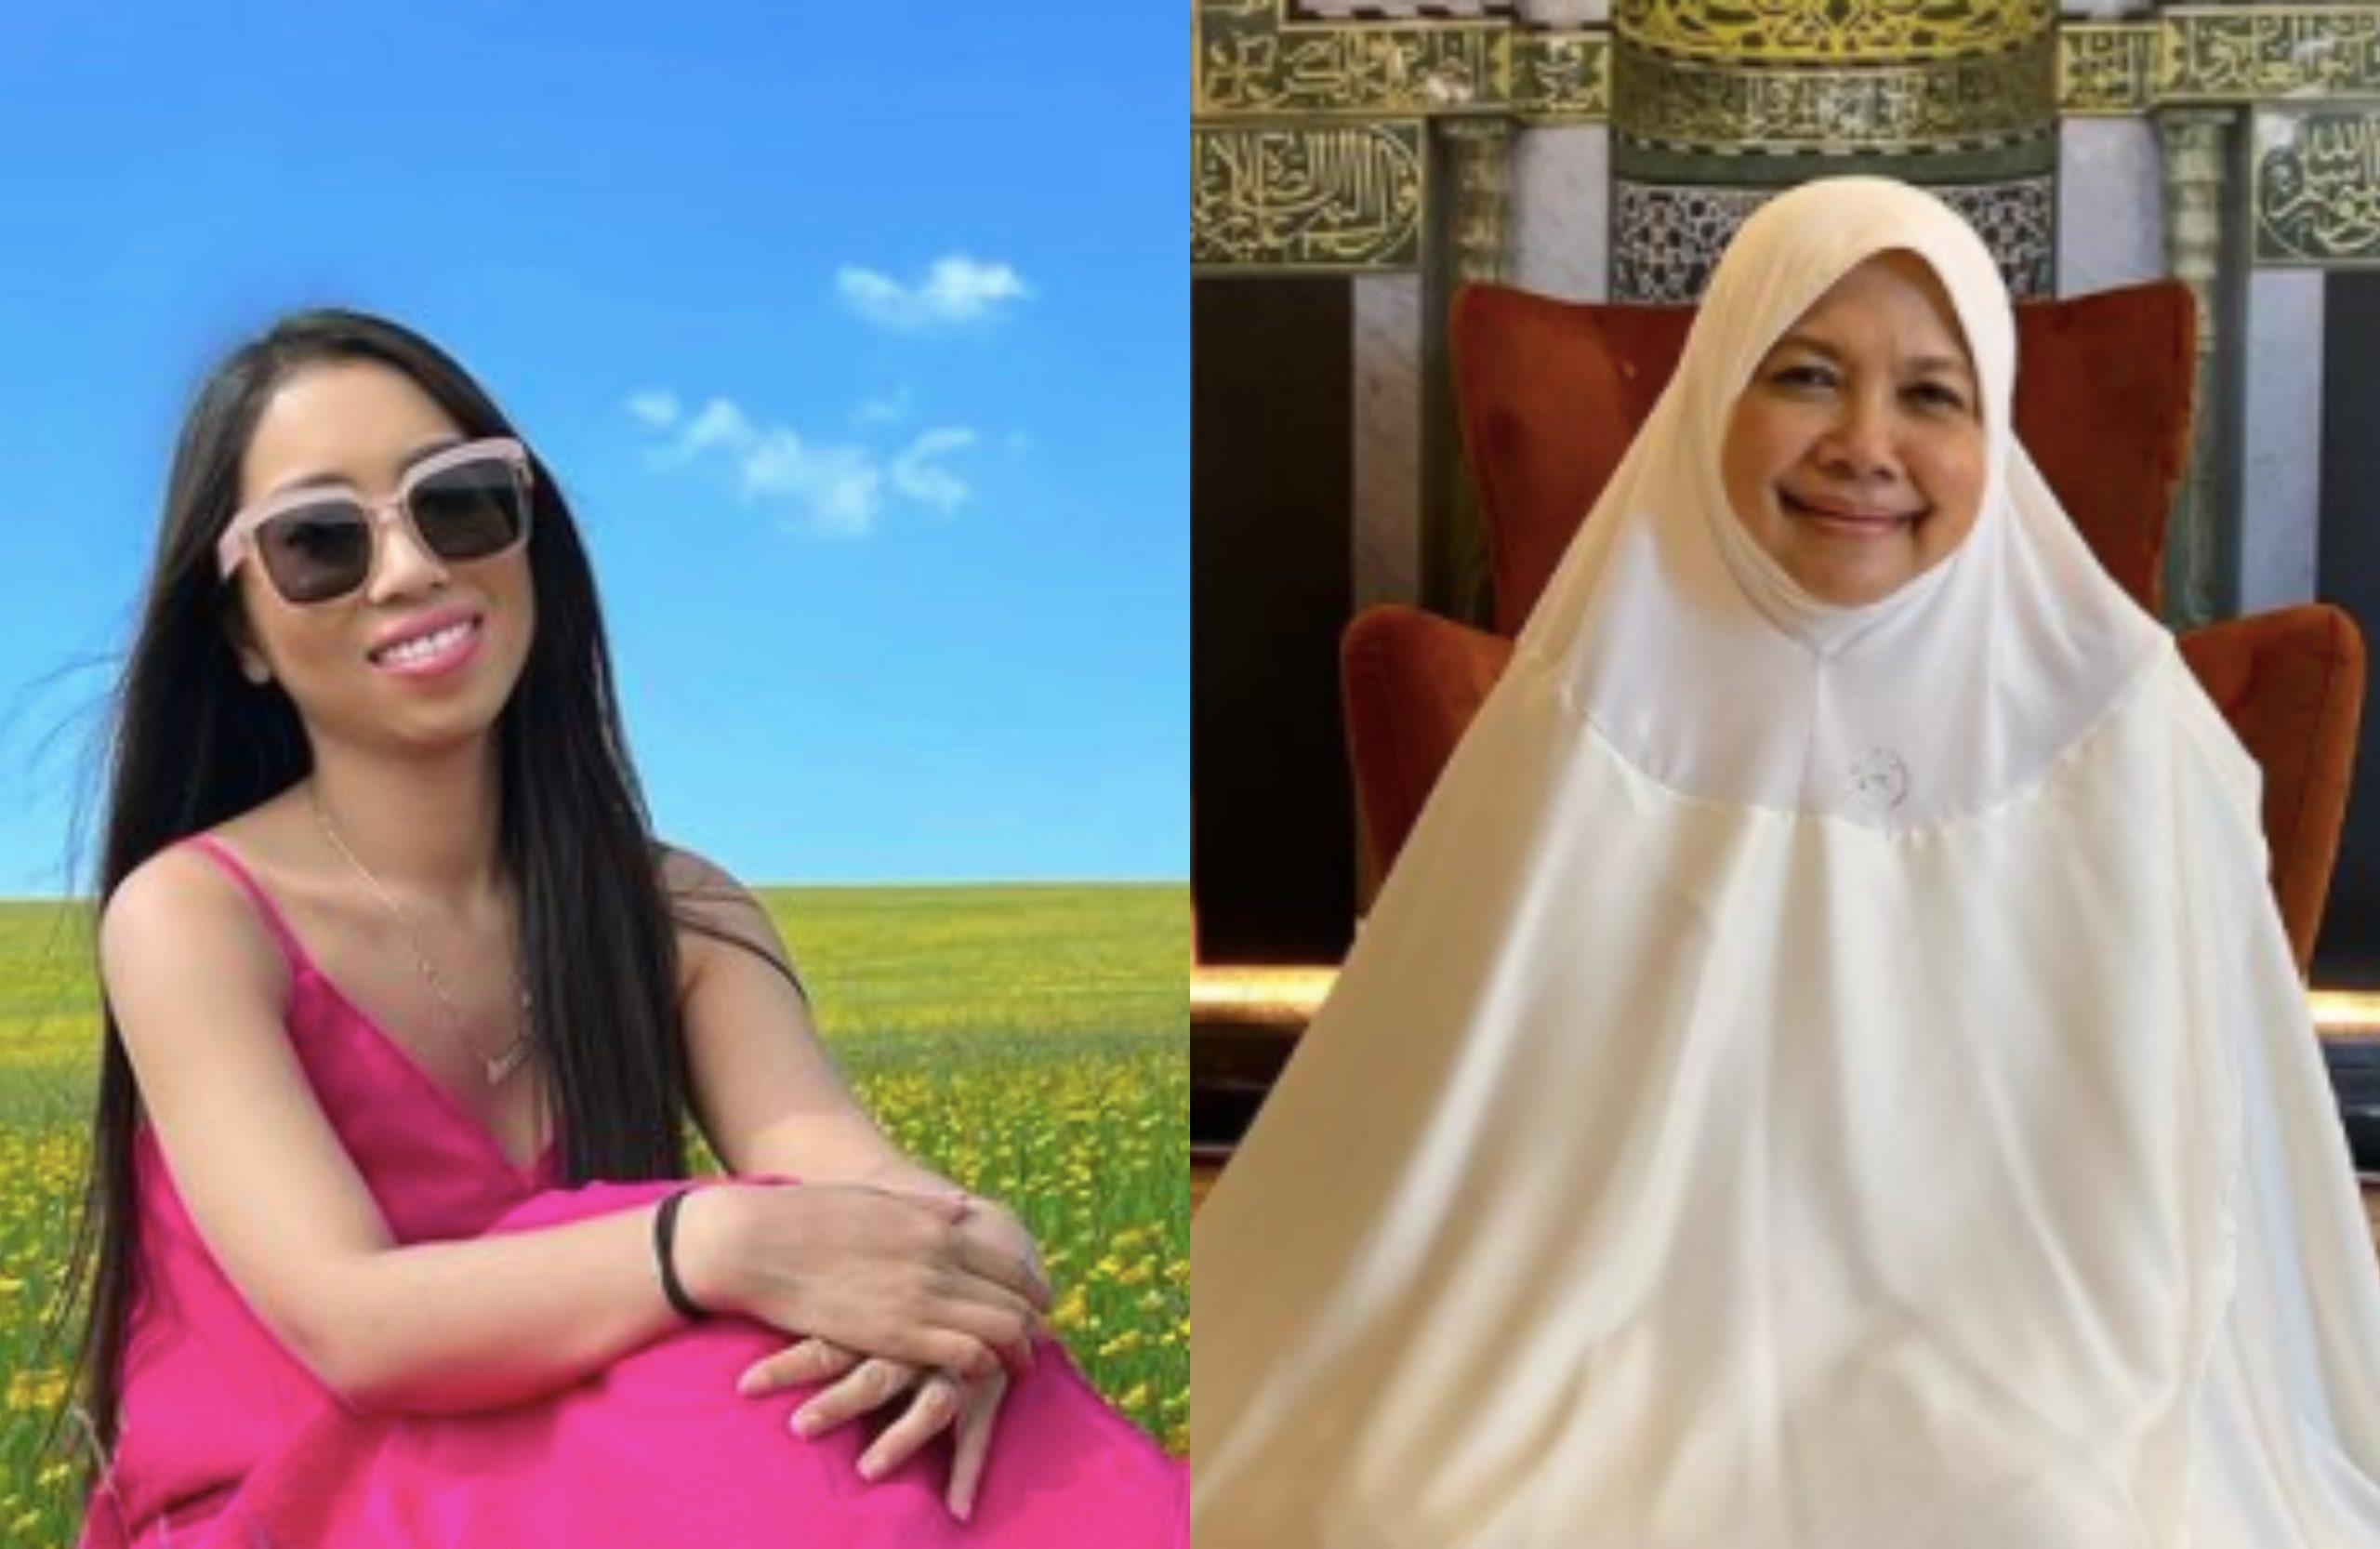 'Mak Saya Tak Ajar Untuk Jadi Bodoh-Bodoh Depan Lelaki…' – Dr Amalina Tampil Bidas Kenyataan Prof Muhaya